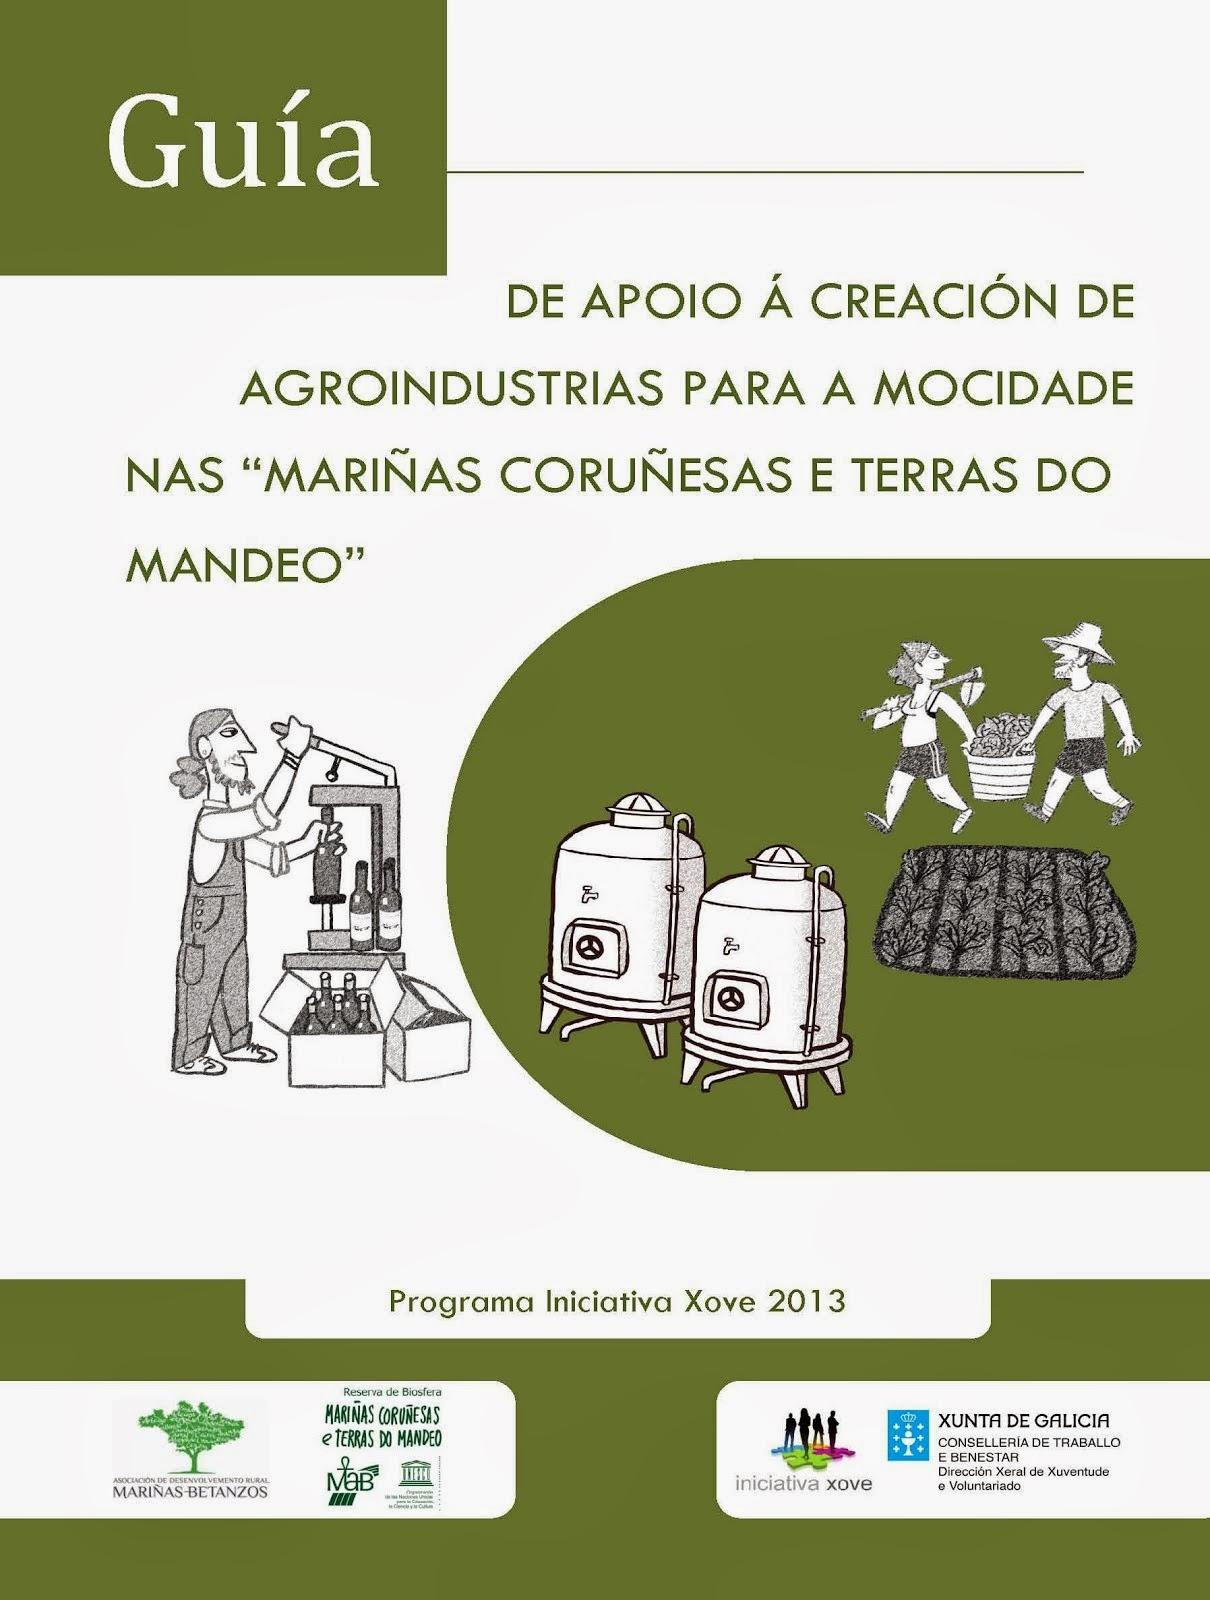 Programa Iniciativa Xove 2013